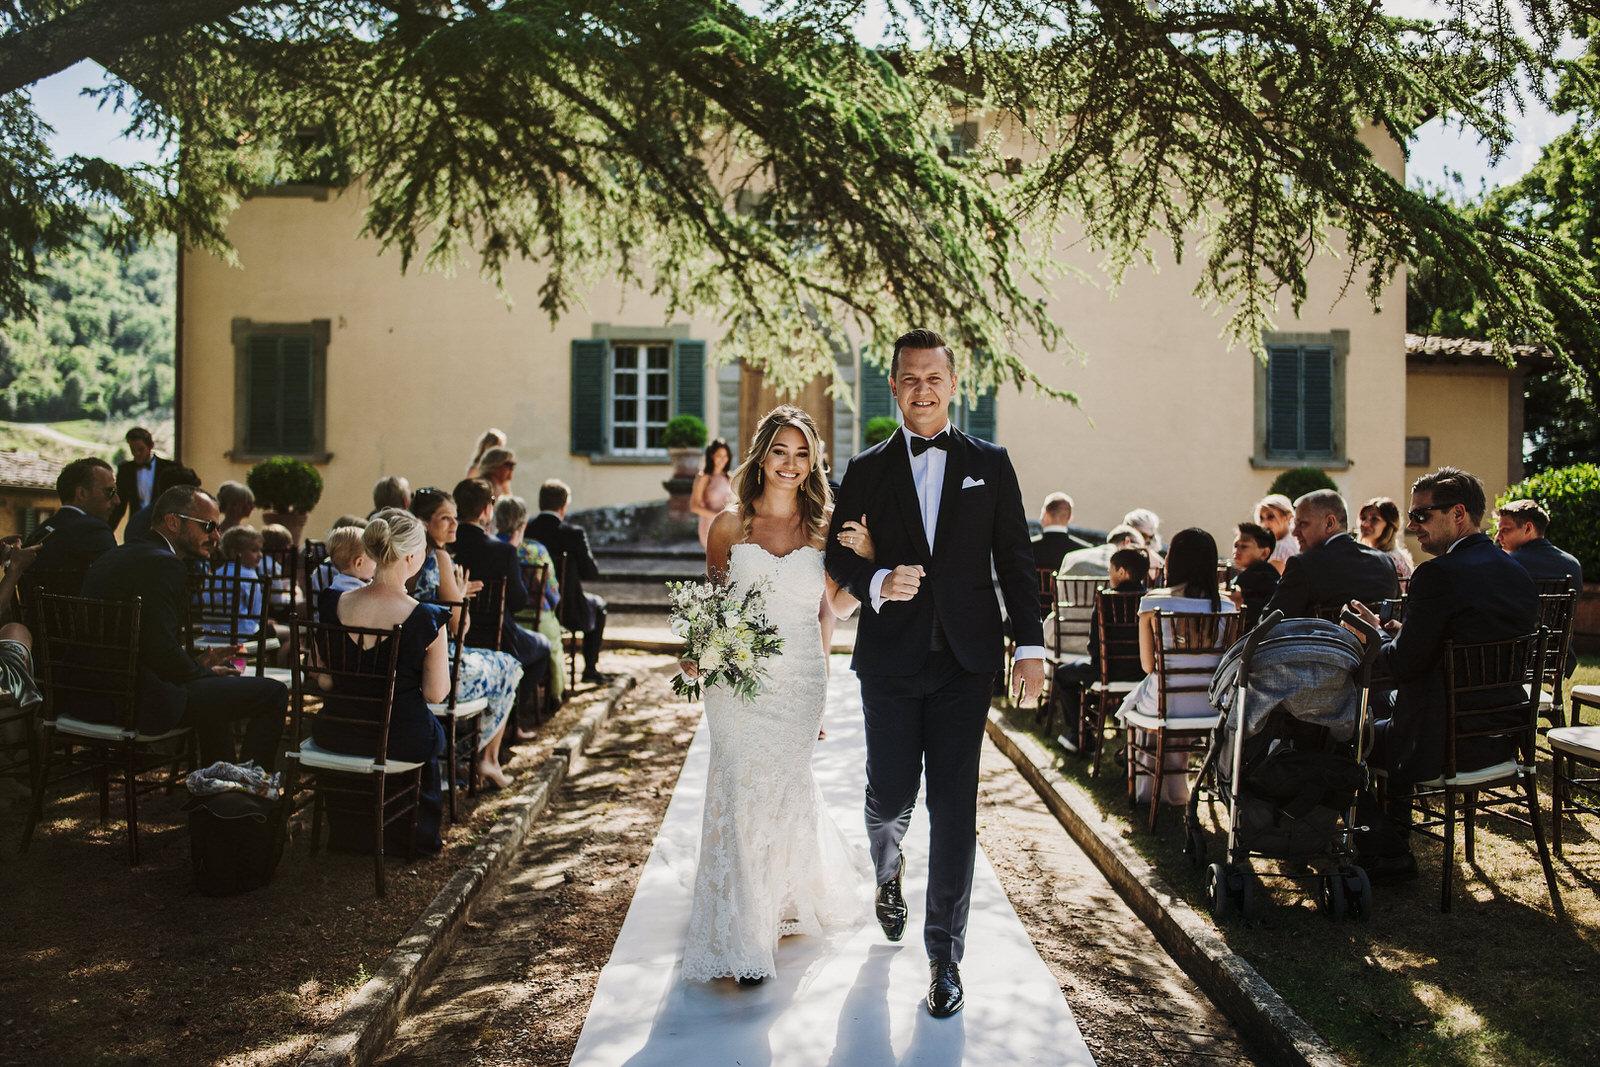 wedding photographer in italy-venice-tuscany-florence-amalfi coast-como lake-villa del balbianello-siena-amalfi-ravello-belmond-villa cimbrone65